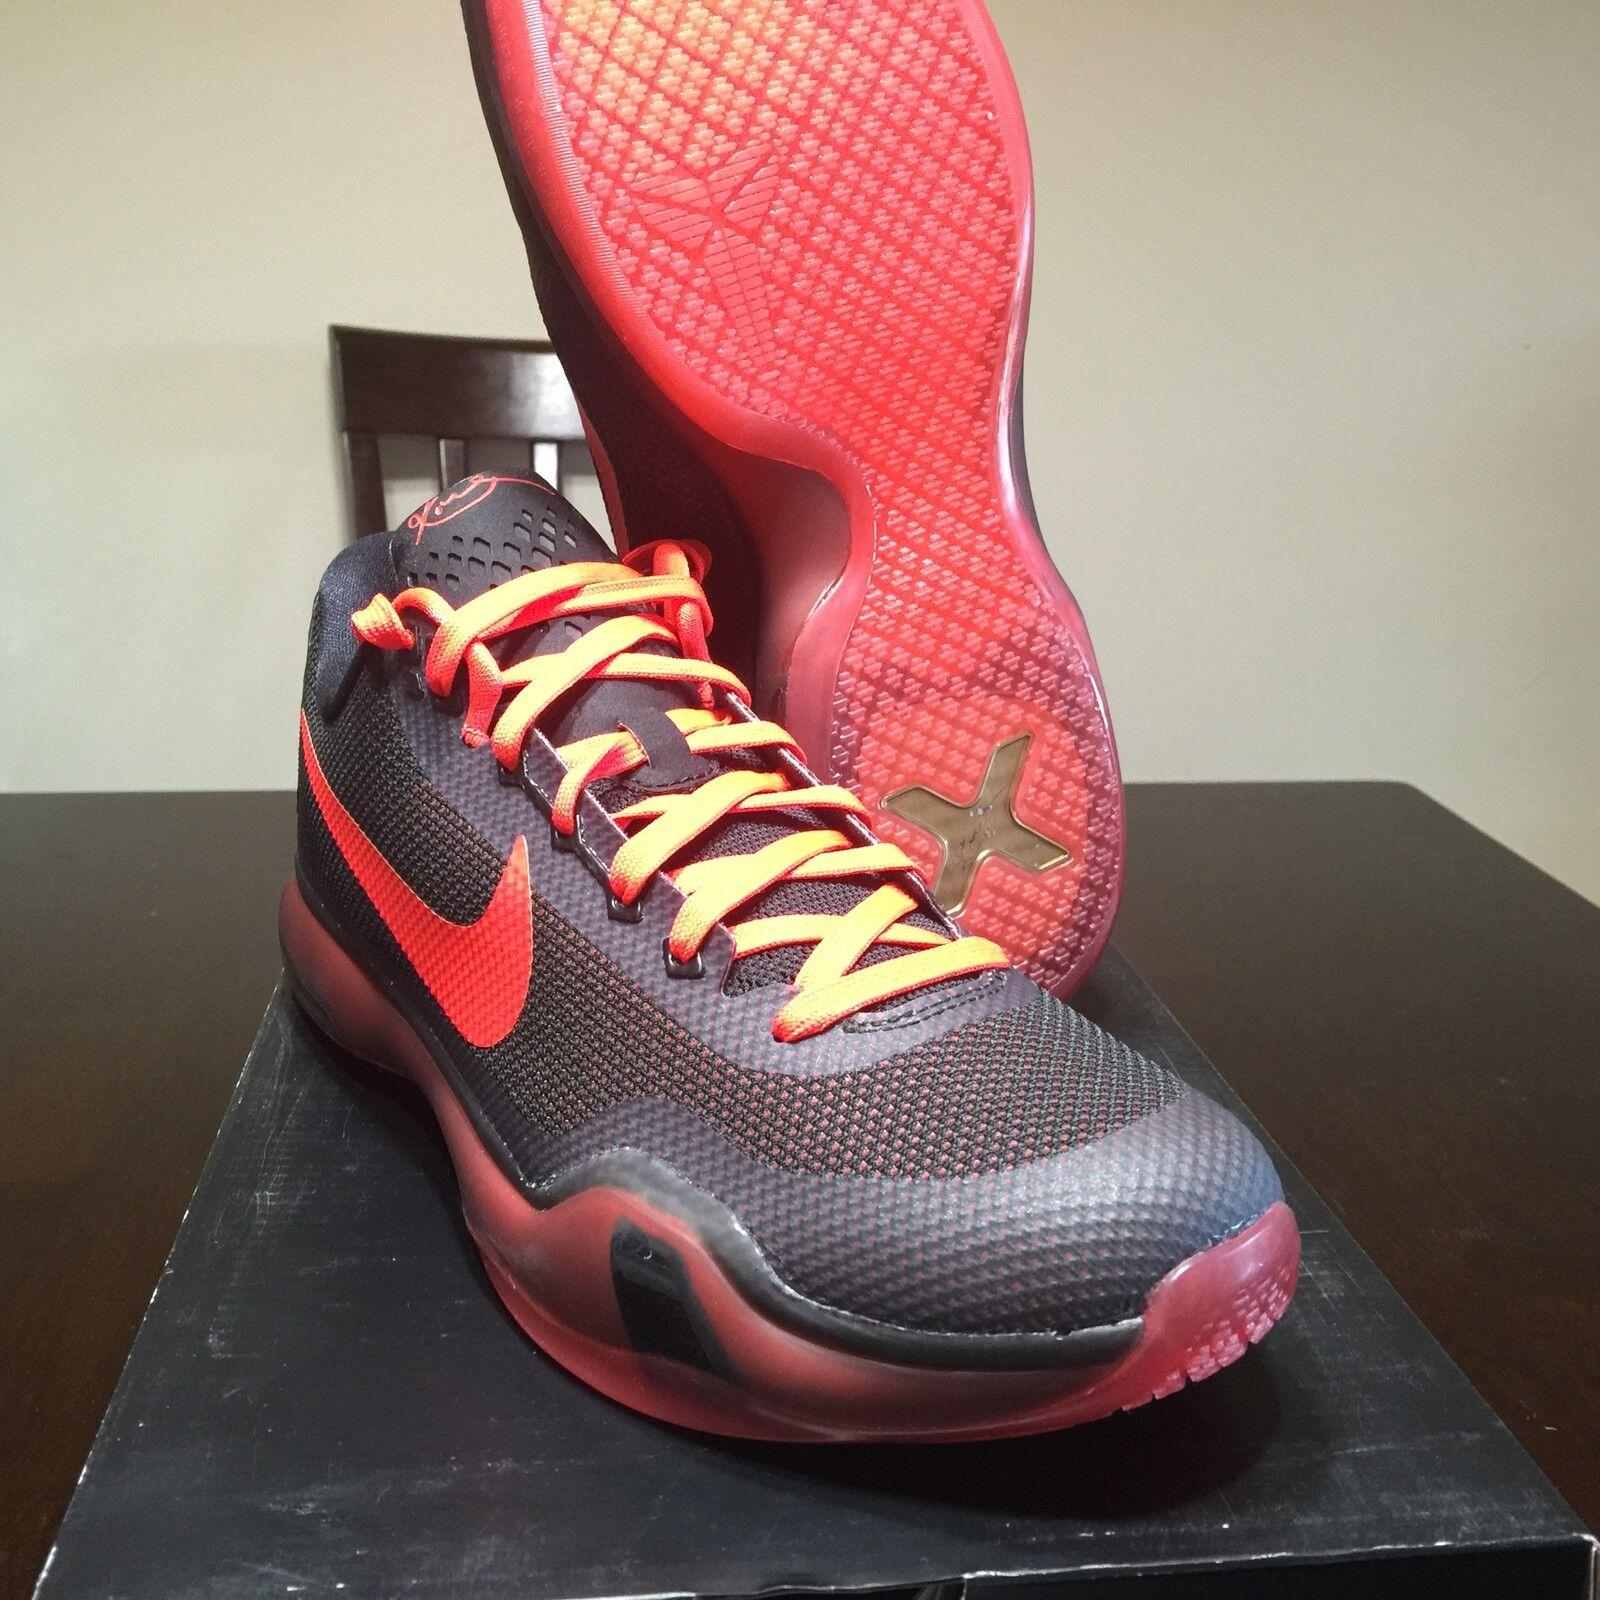 Nike Air KOBE Low X 10 Black what the Prelude 8 - 14 mamba moment 9 High 8 7 6 5